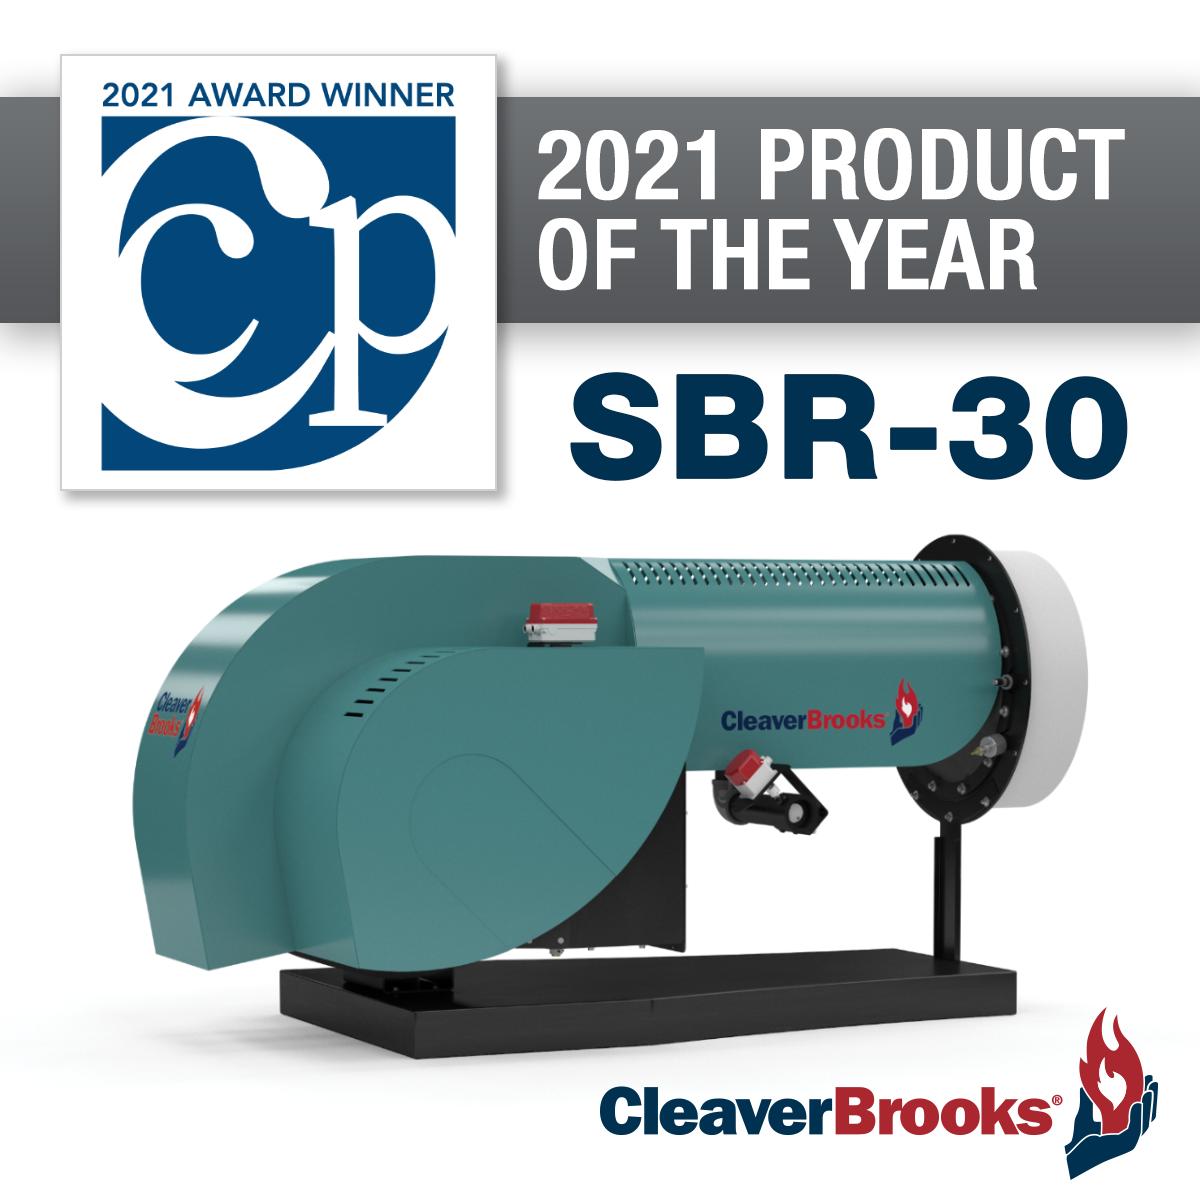 SBR-30 Burner